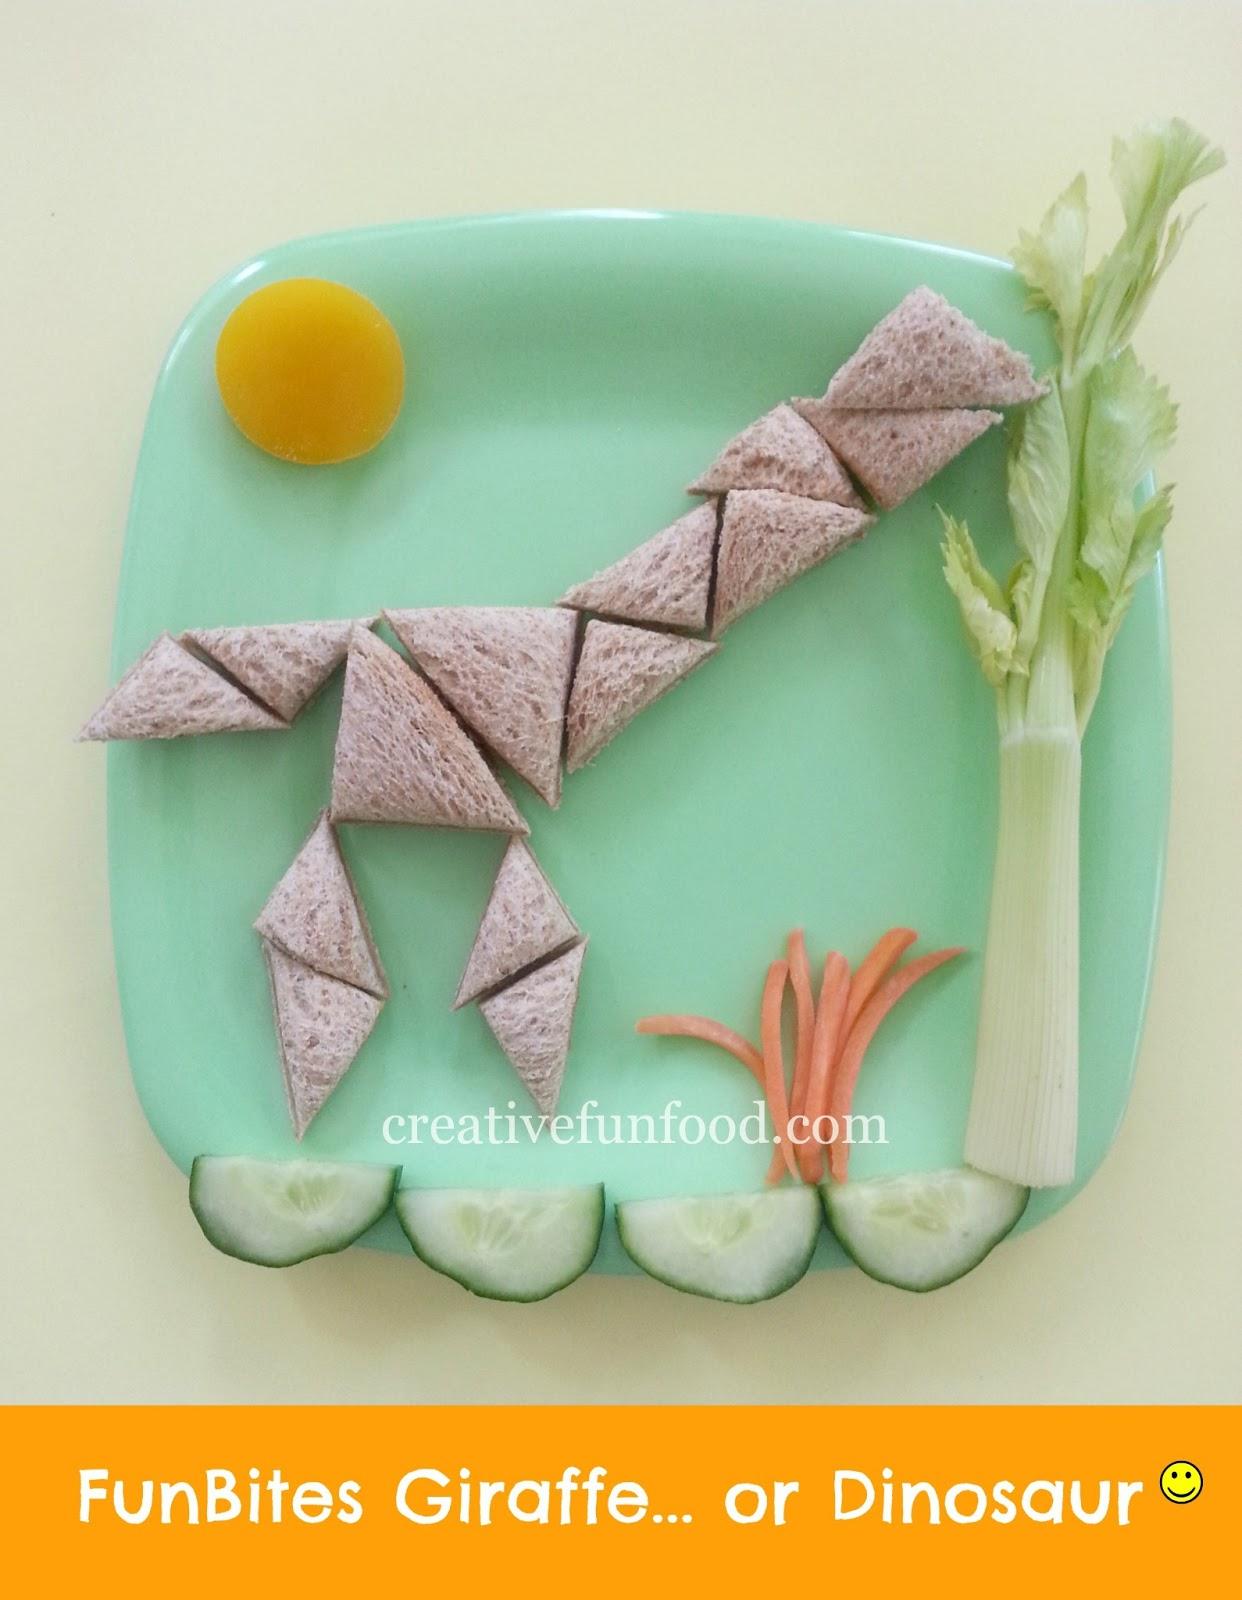 Creative food funbites giraffe or dinosaur for Funbites